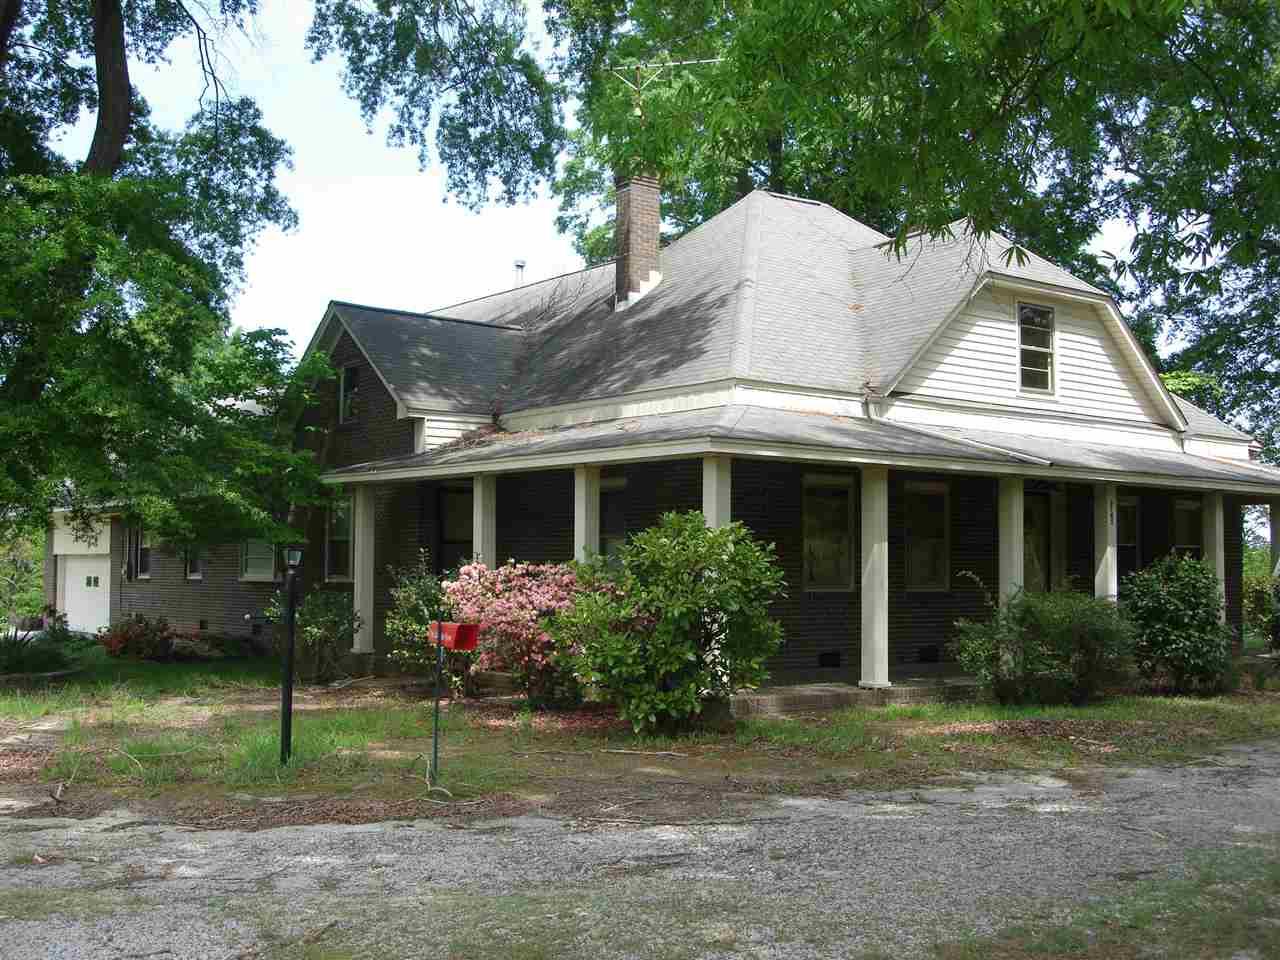 Real Estate for Sale, ListingId: 33135330, Kershaw,SC29067